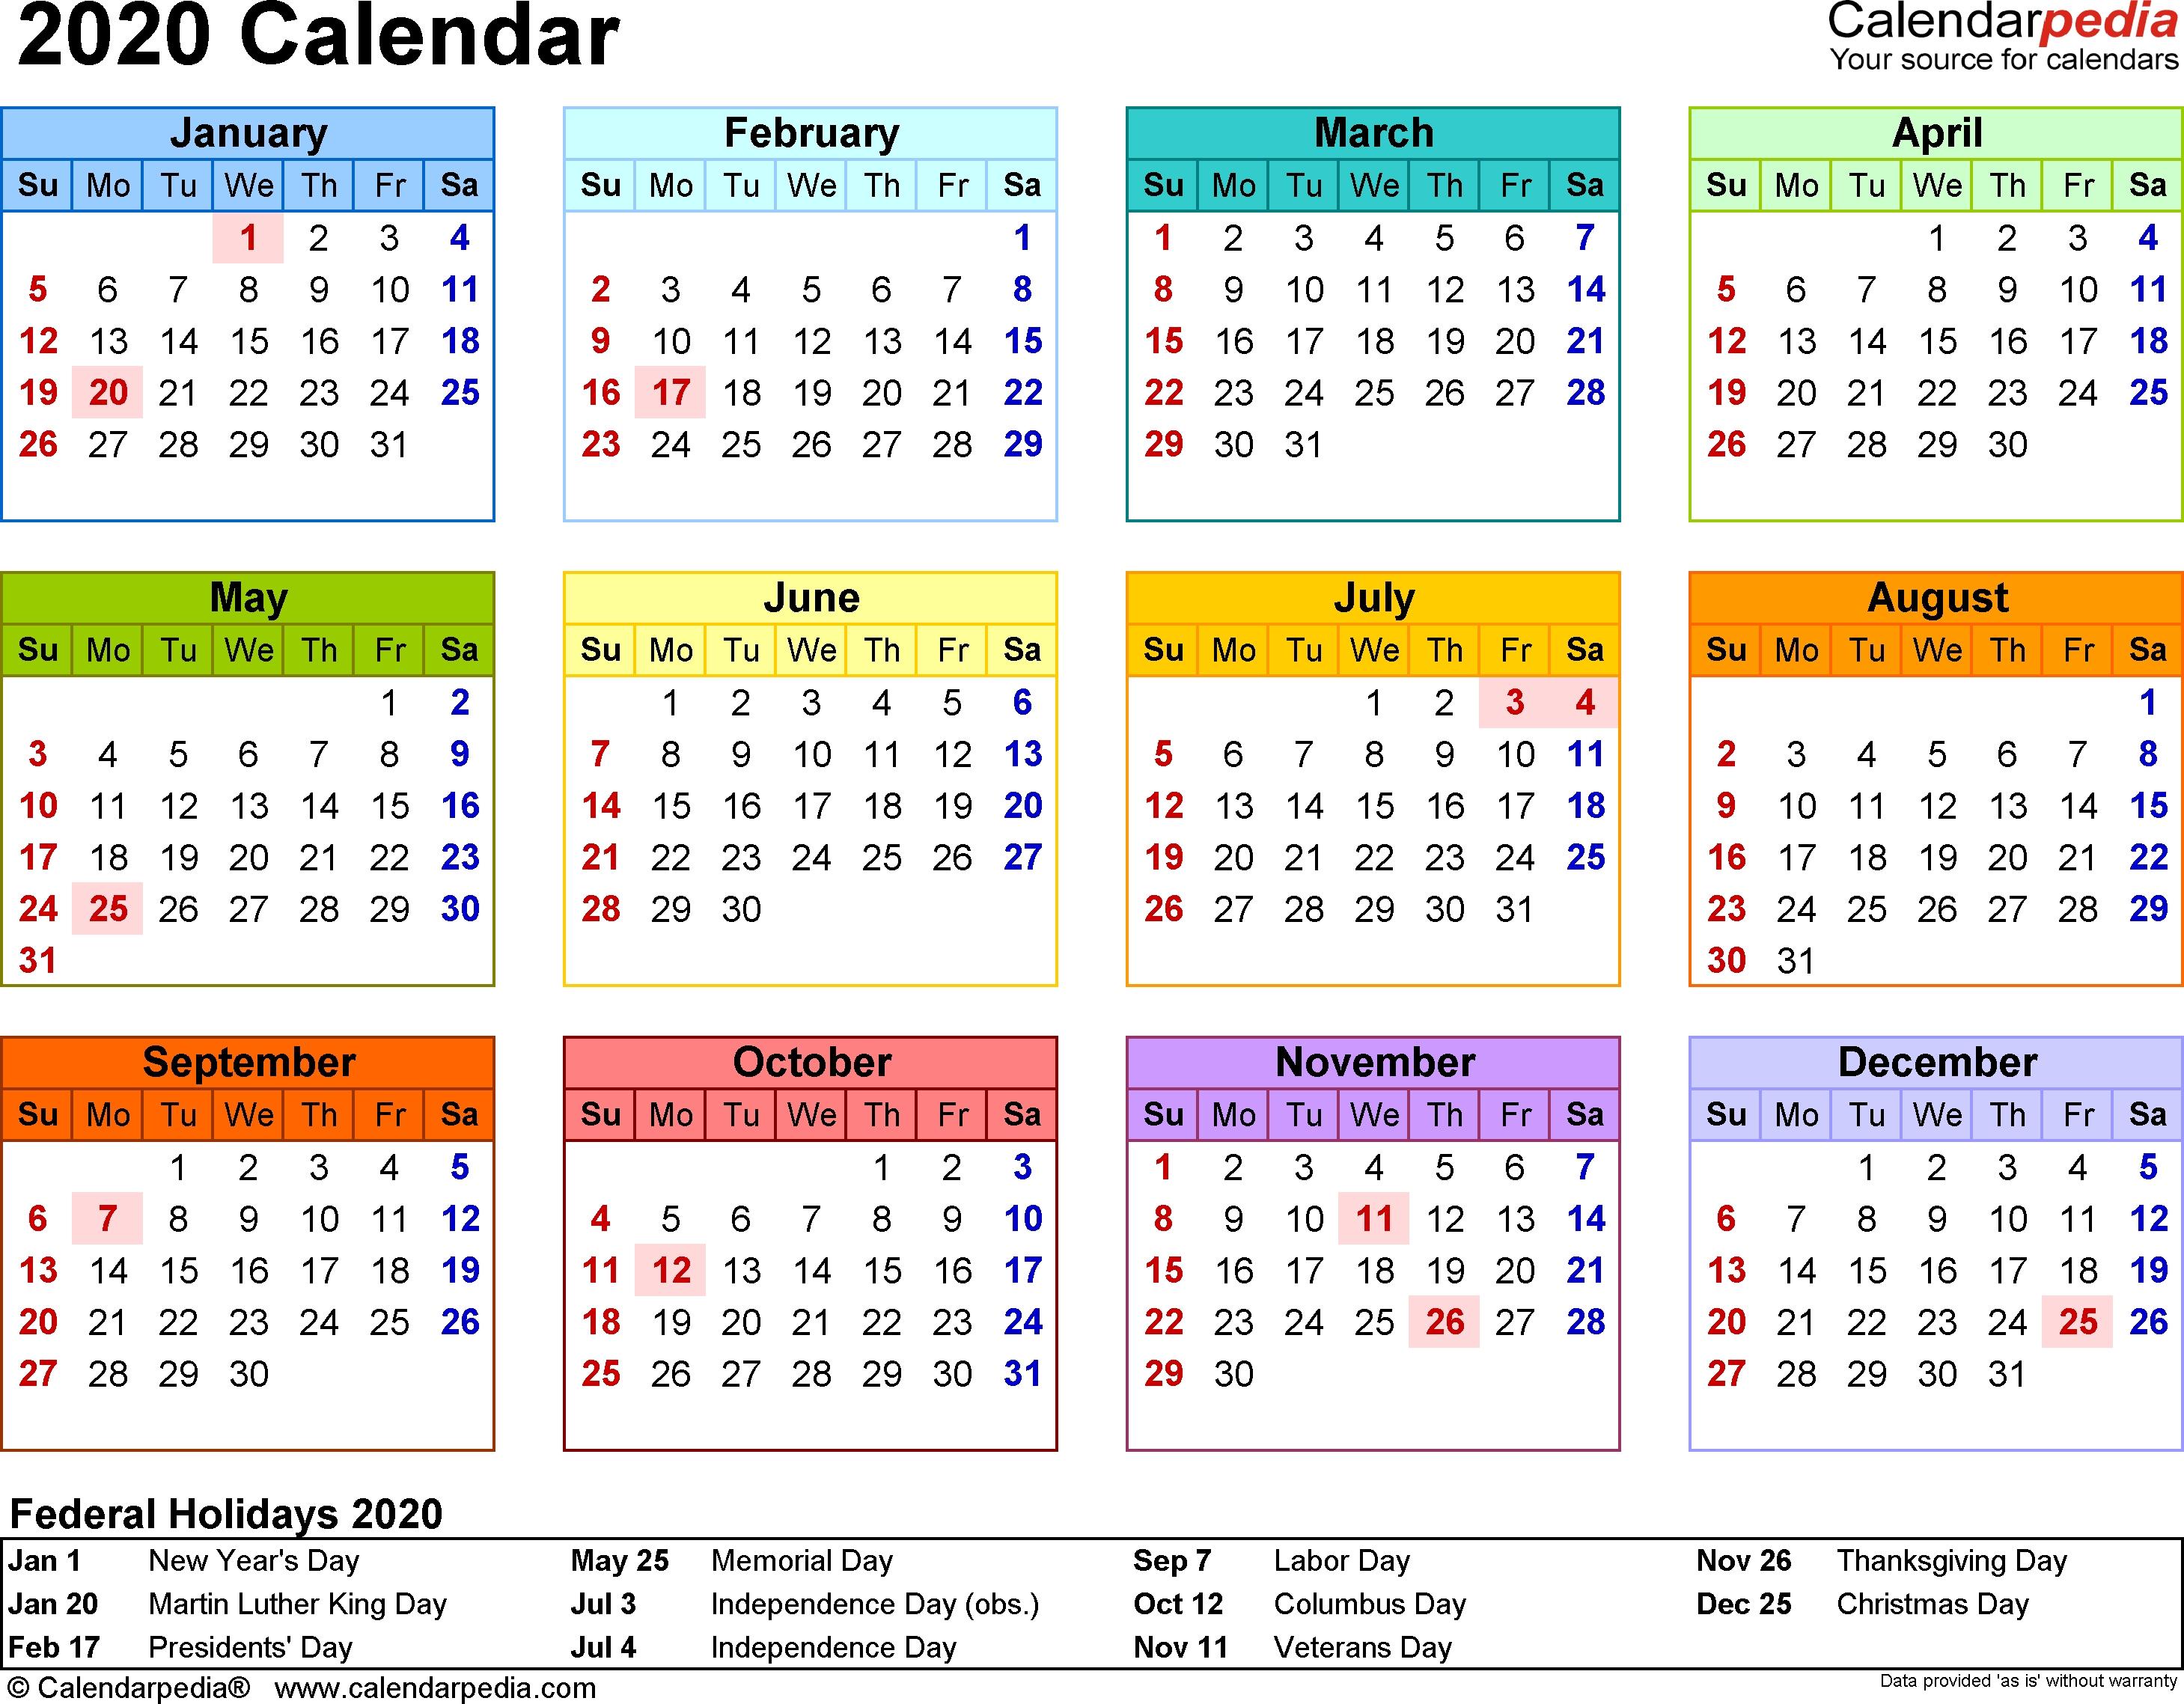 2020 Calendar - 17 Free Printable Word Calendar Templates 2020 Yearly Calendar Template Word